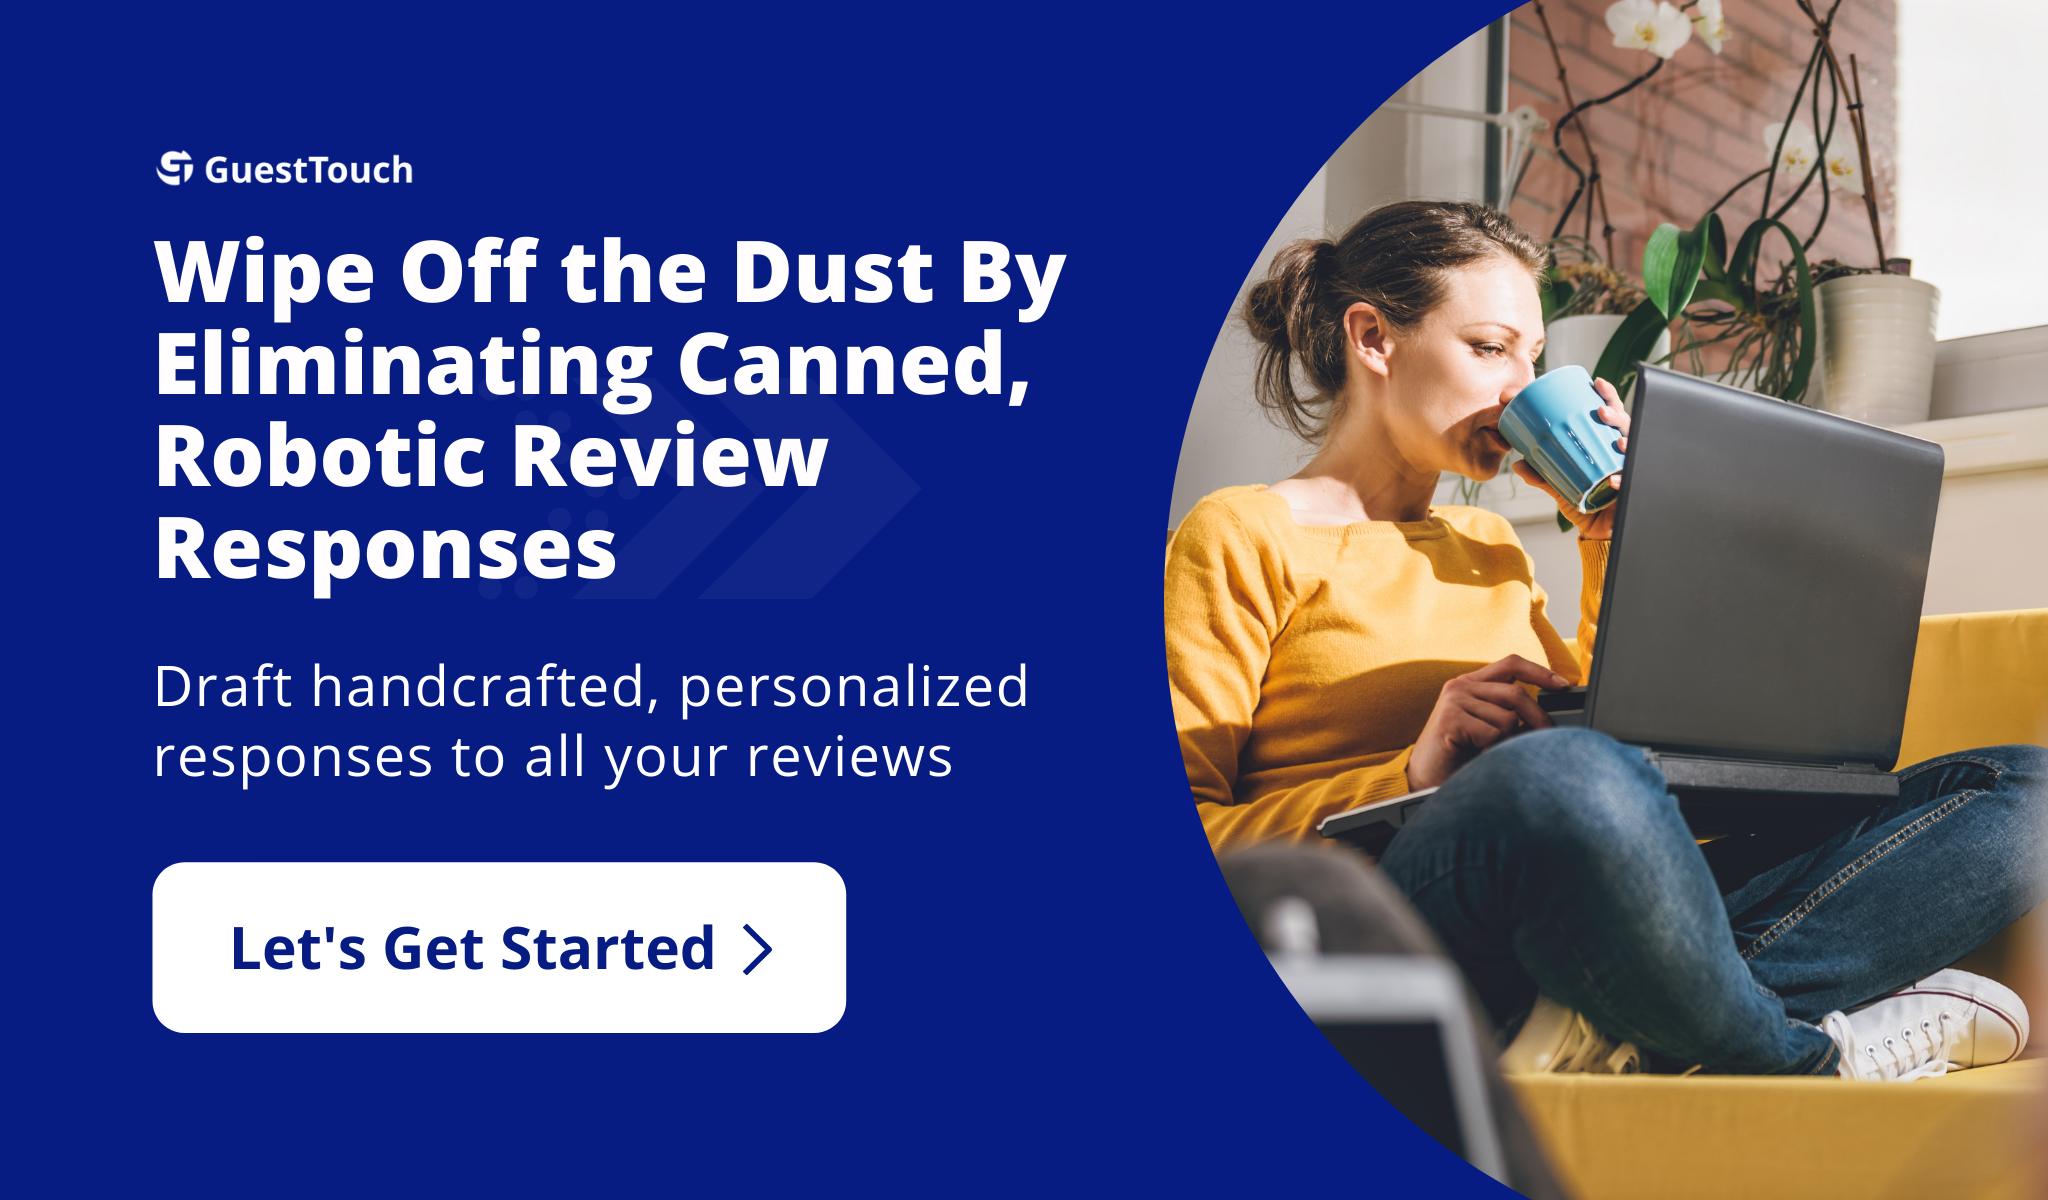 cleanliness reviews desktop CTA